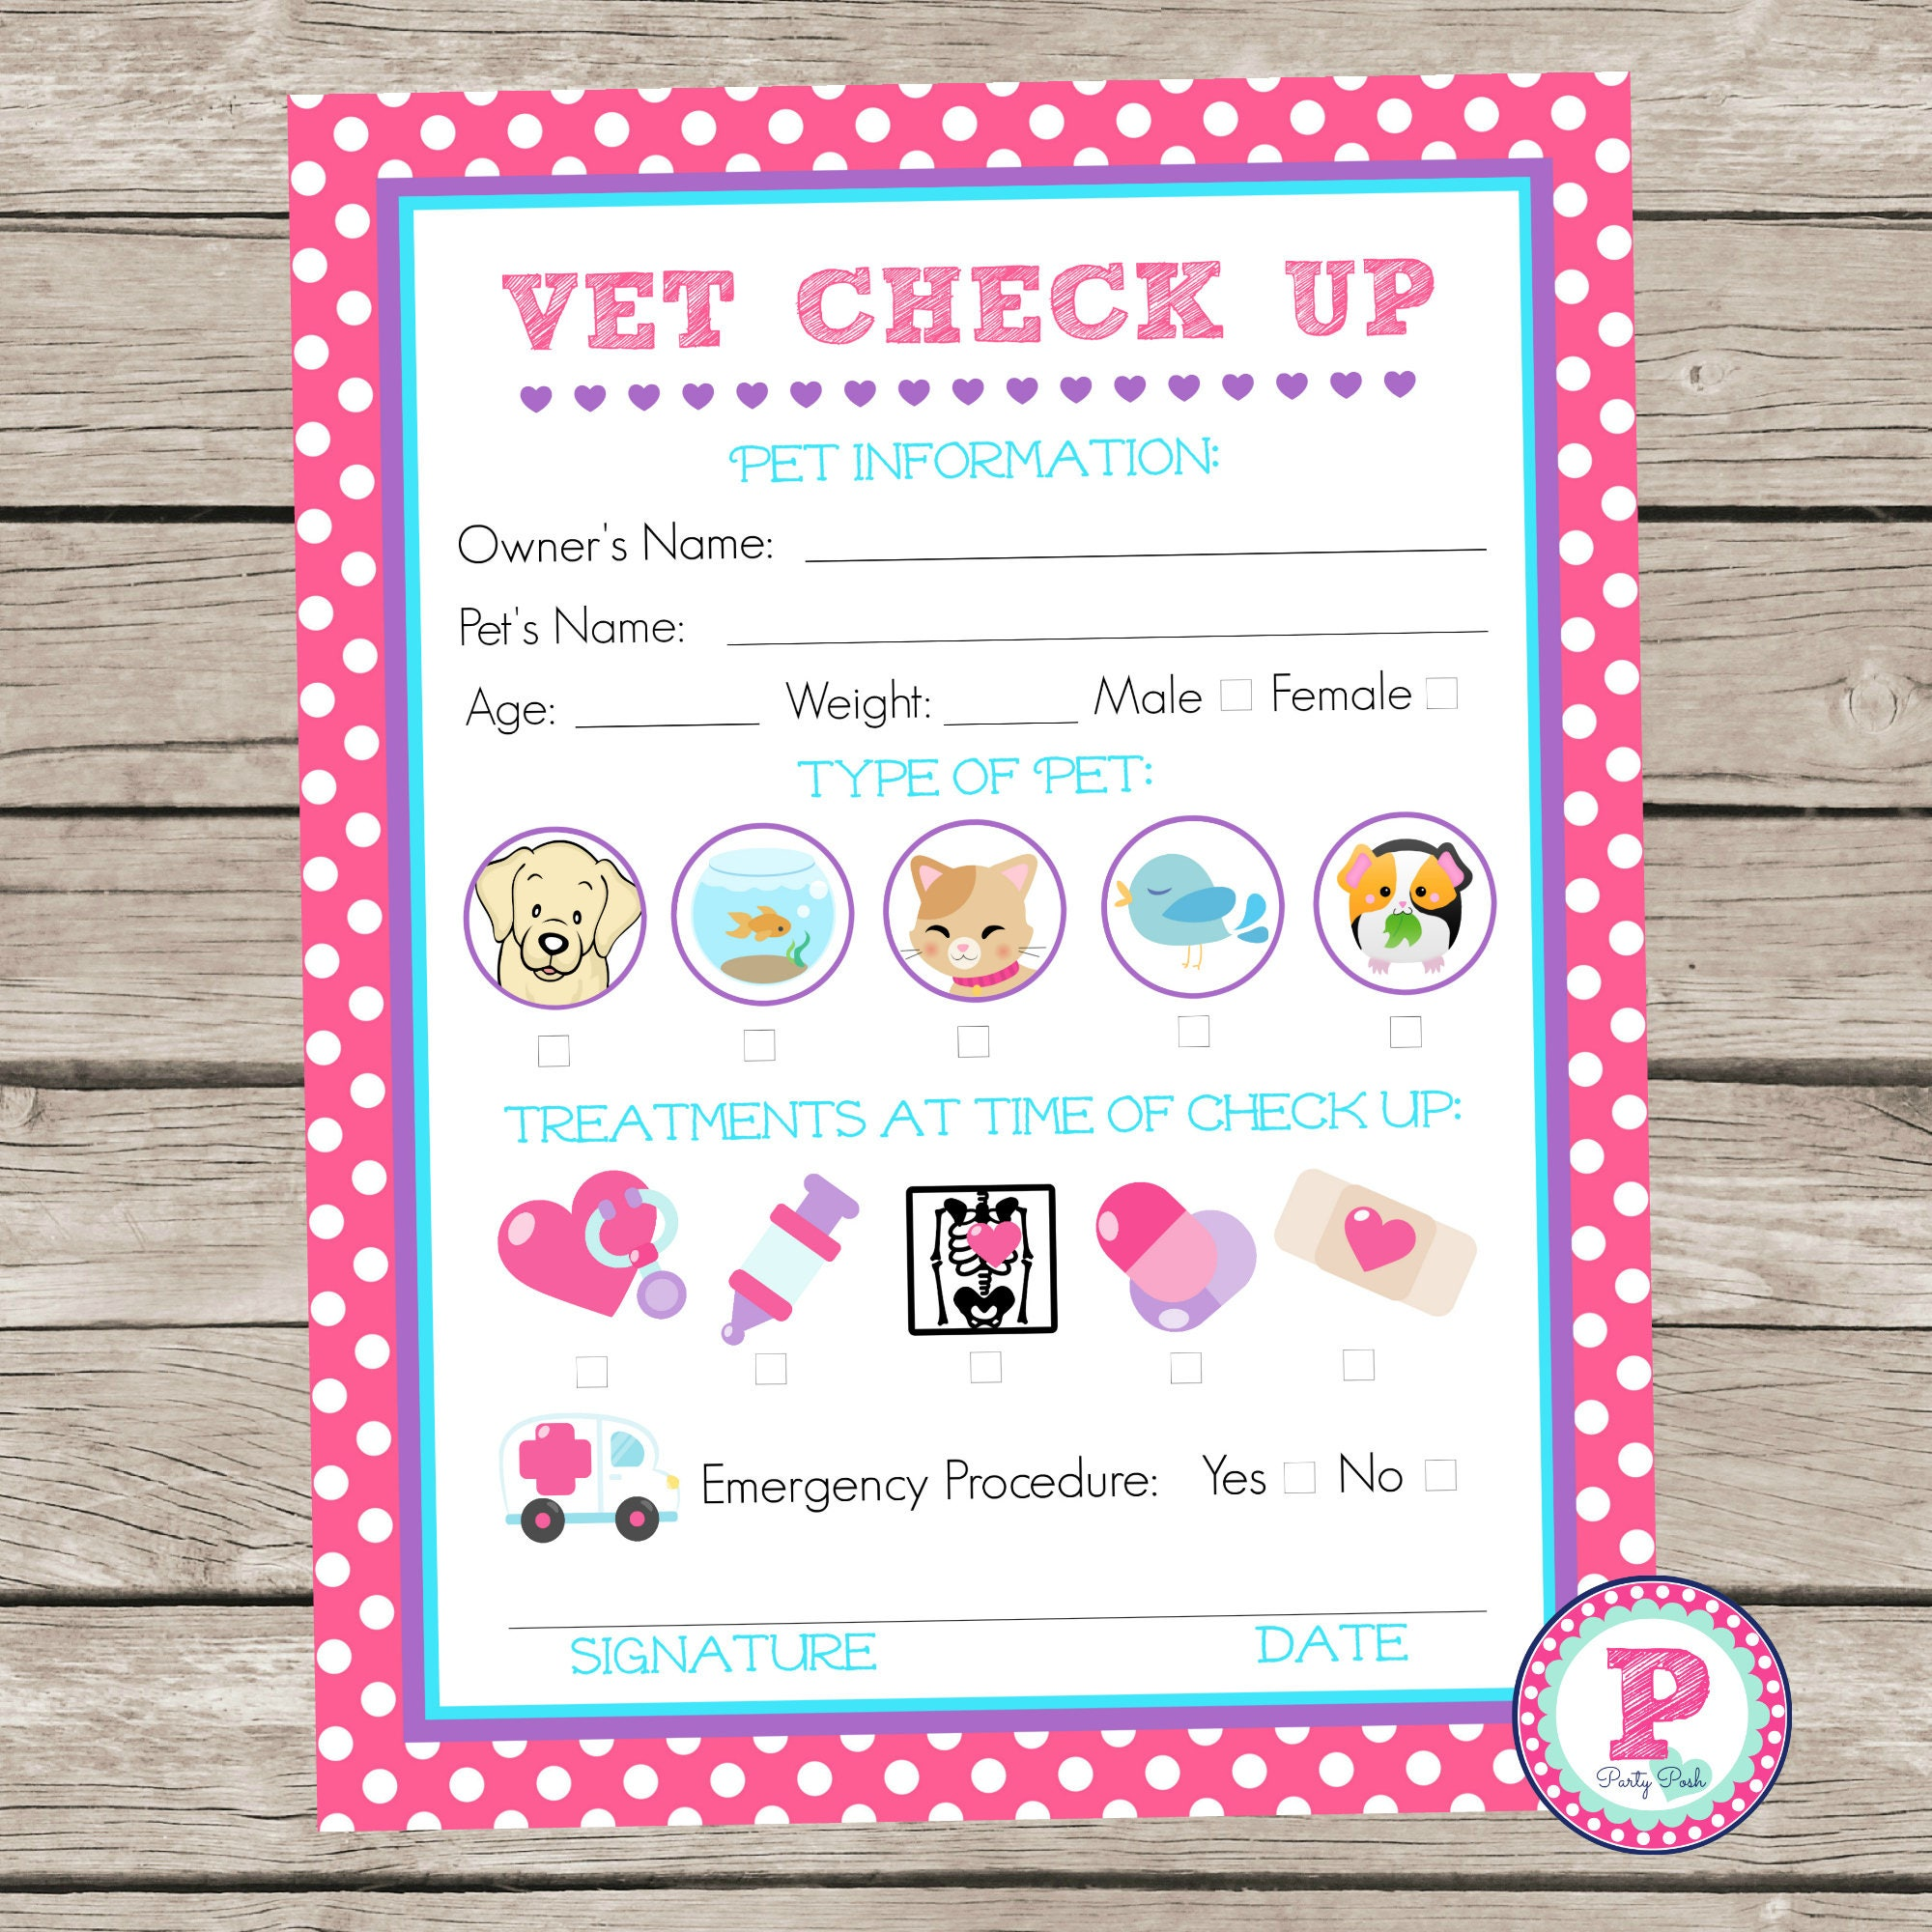 Adopt a Pet Vet Checkup Birthday Party Ideas Polka Dot